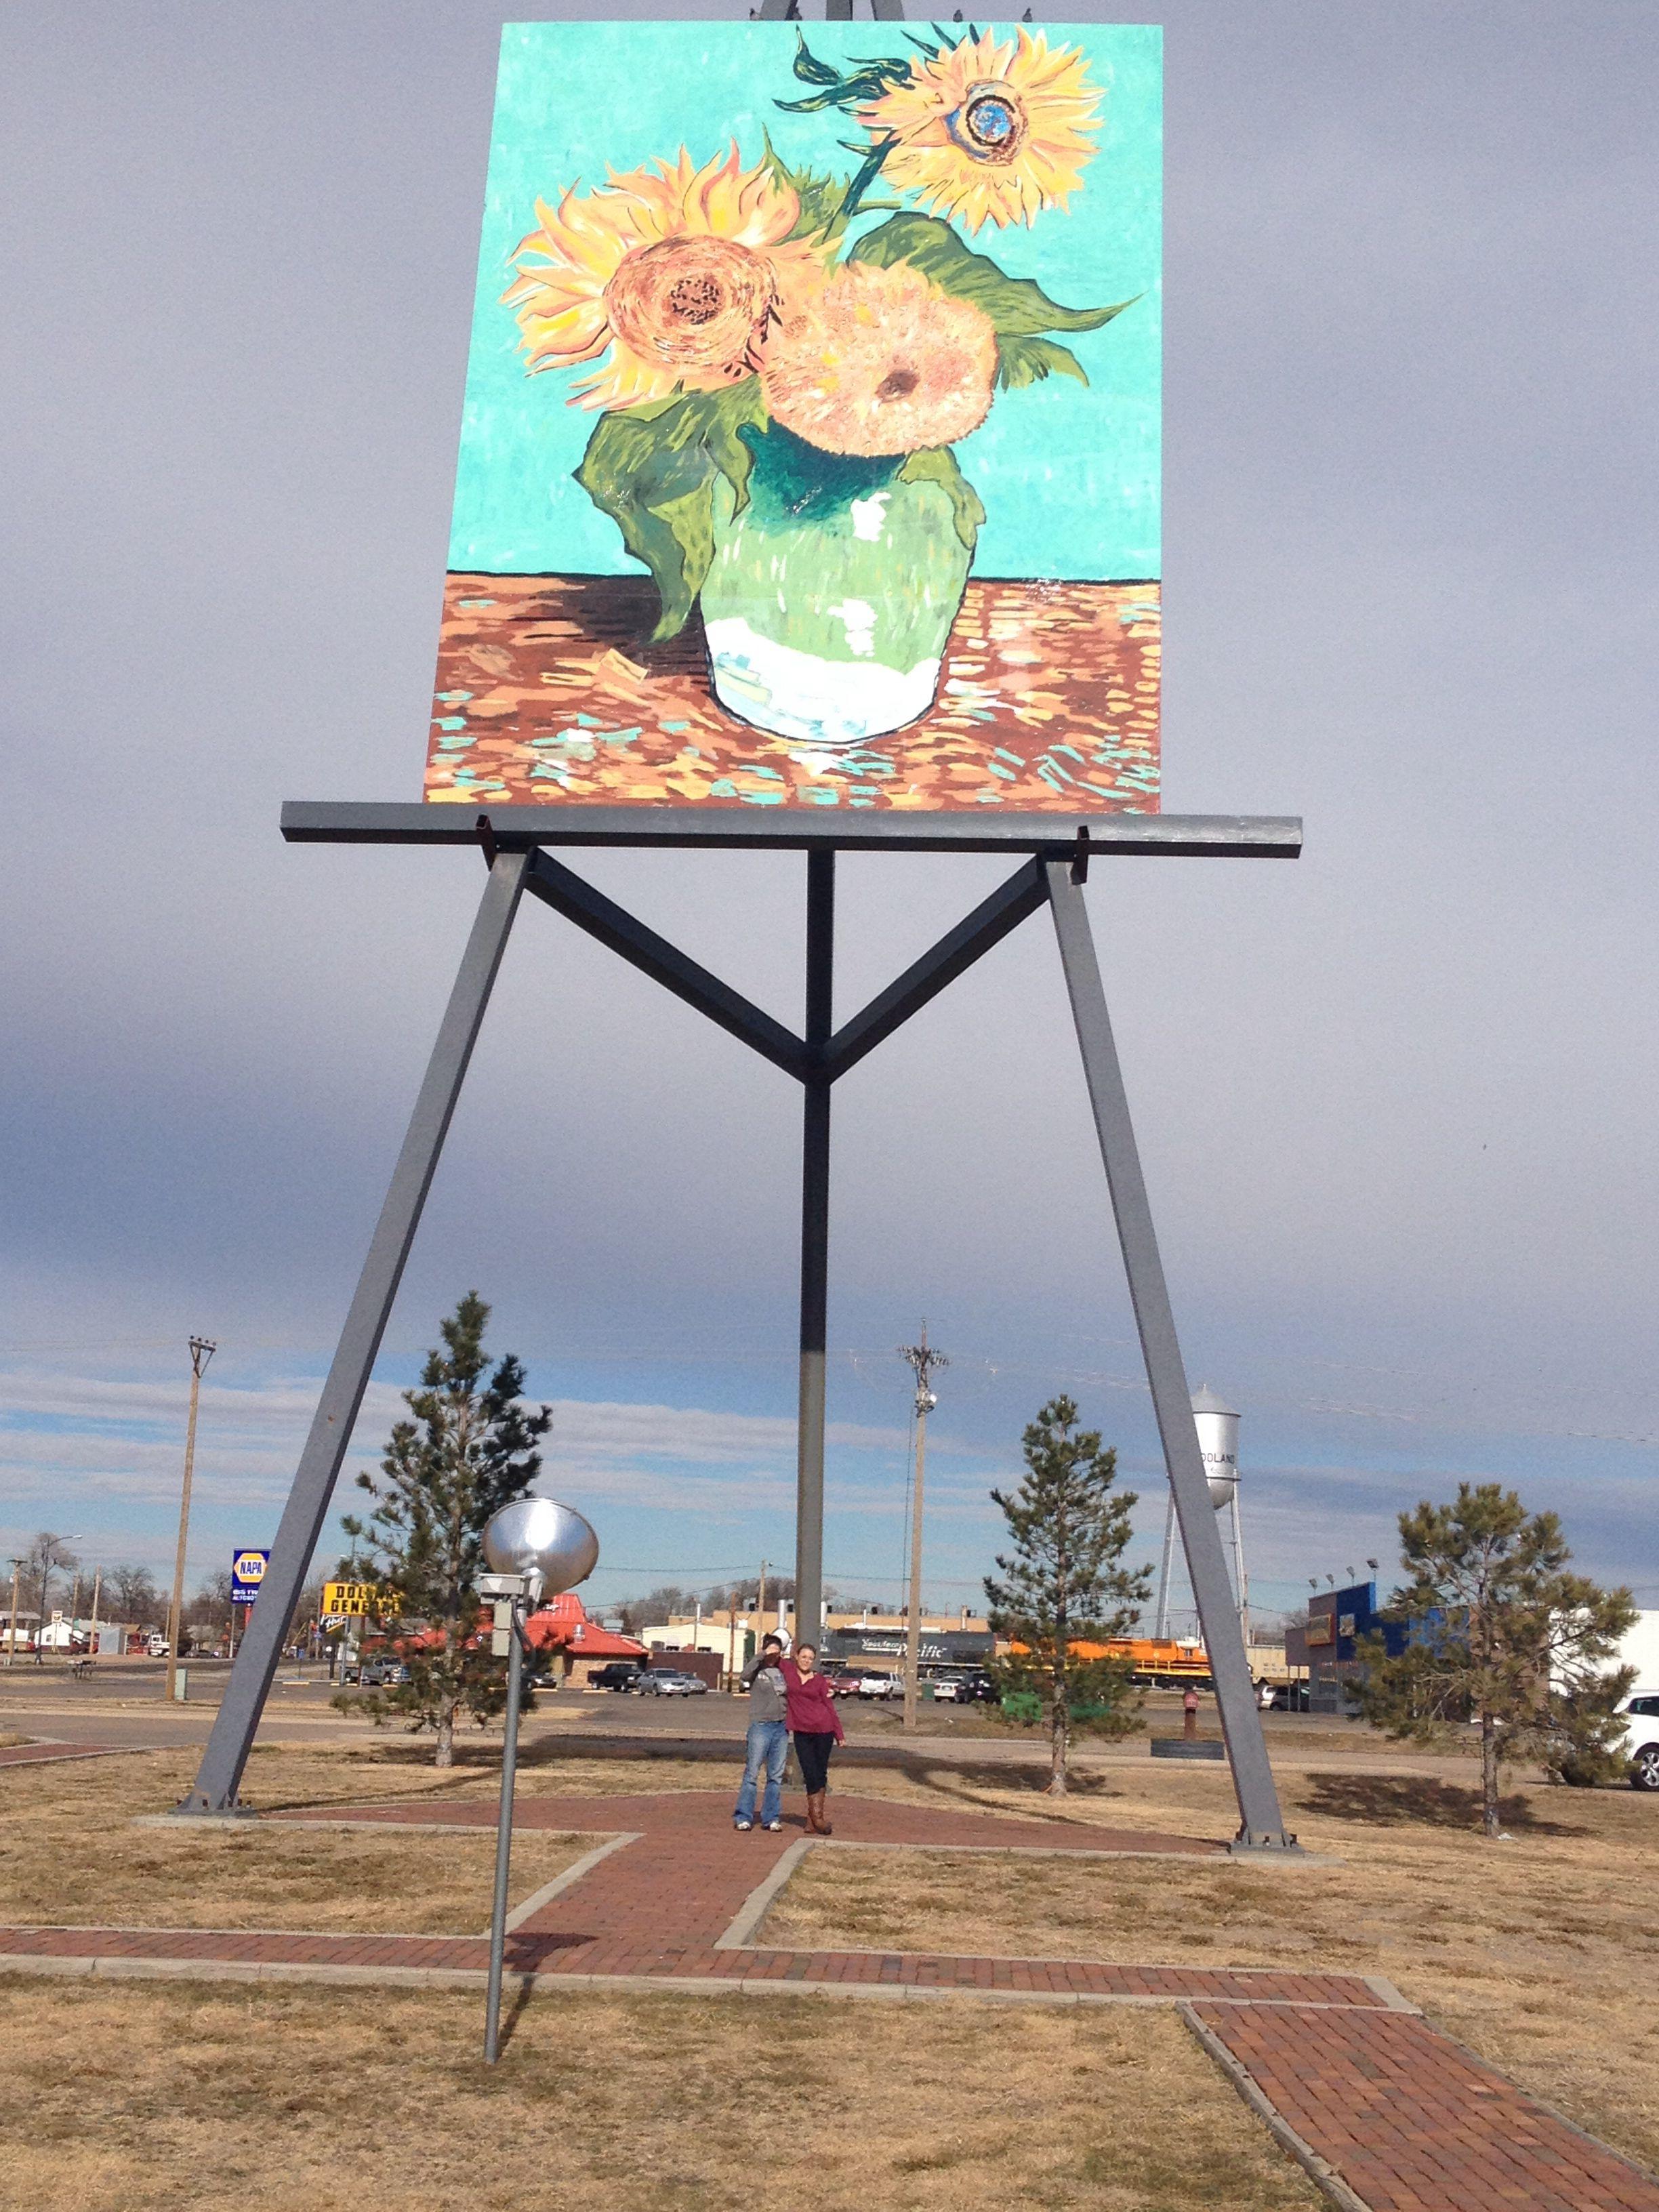 Largest Van Go! Goodland Kansas! Travel! Large